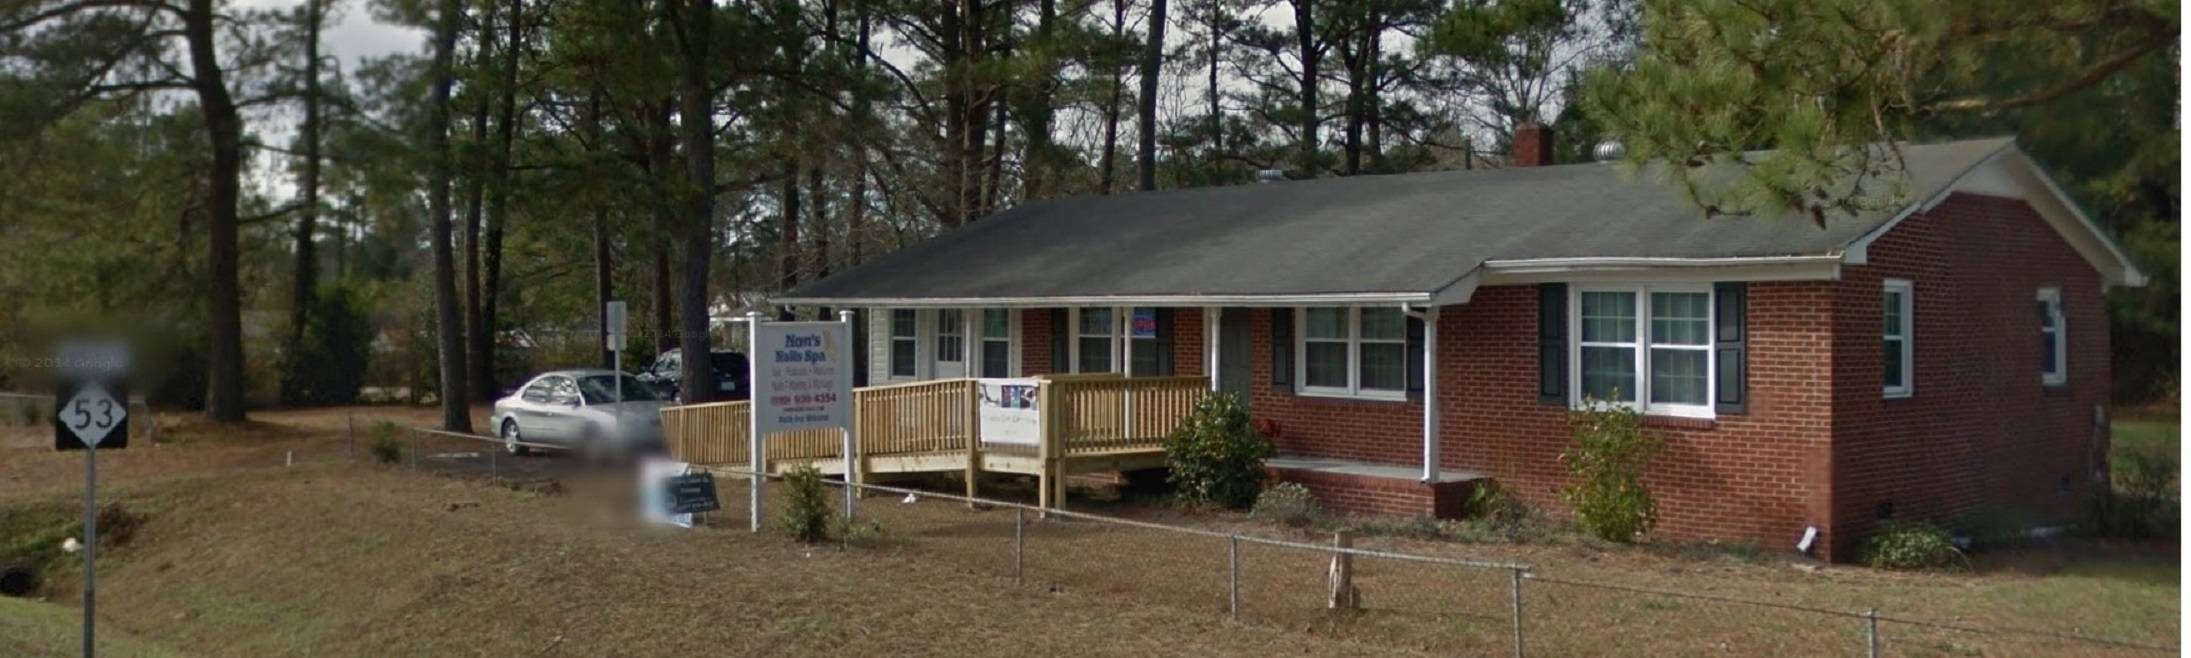 Nan's Nails, 1186 Burgaw Hwy , Jacksonville, NC, 28540, United States